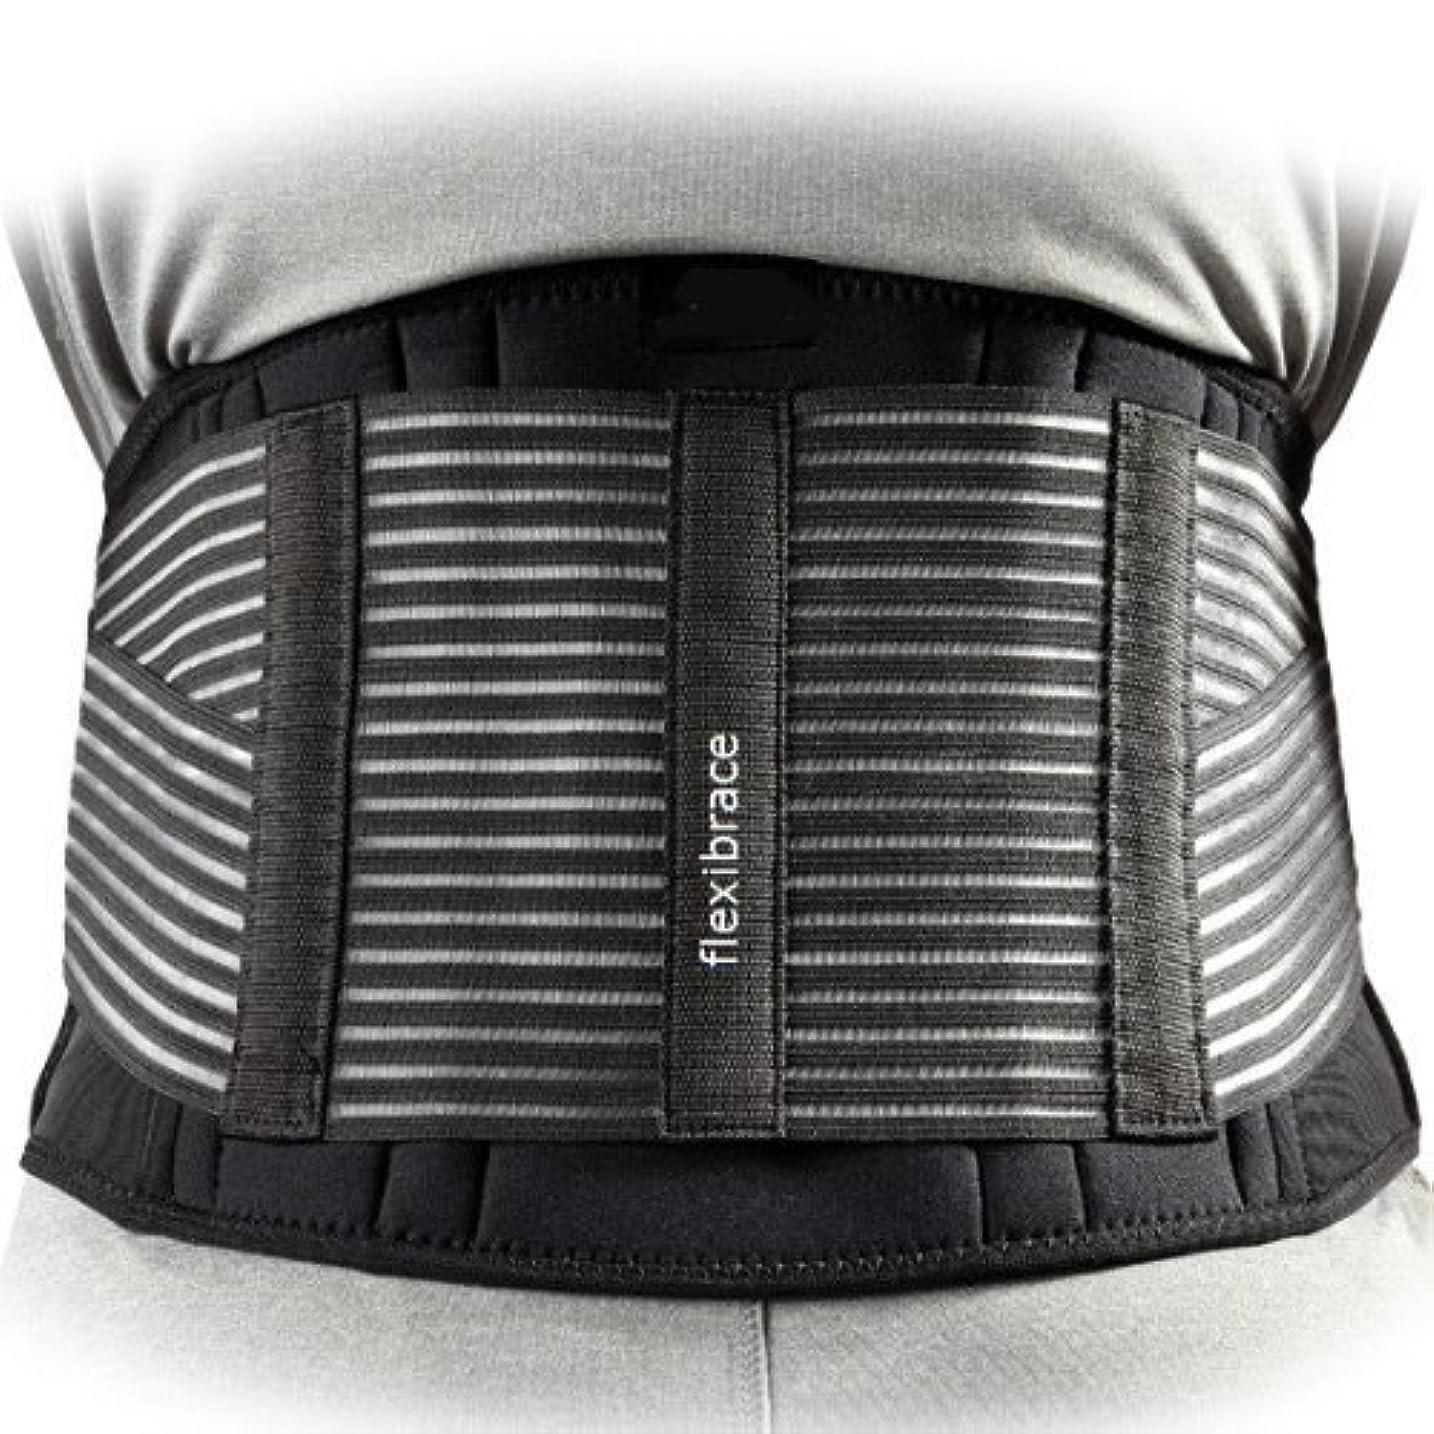 Flexibrace社 アメリカで一番売れている 骨盤ベルト コルセット (腰痛ケア)海外直送品?並行輸入品 (Mサイズ ウエスト67cmから 83cm)